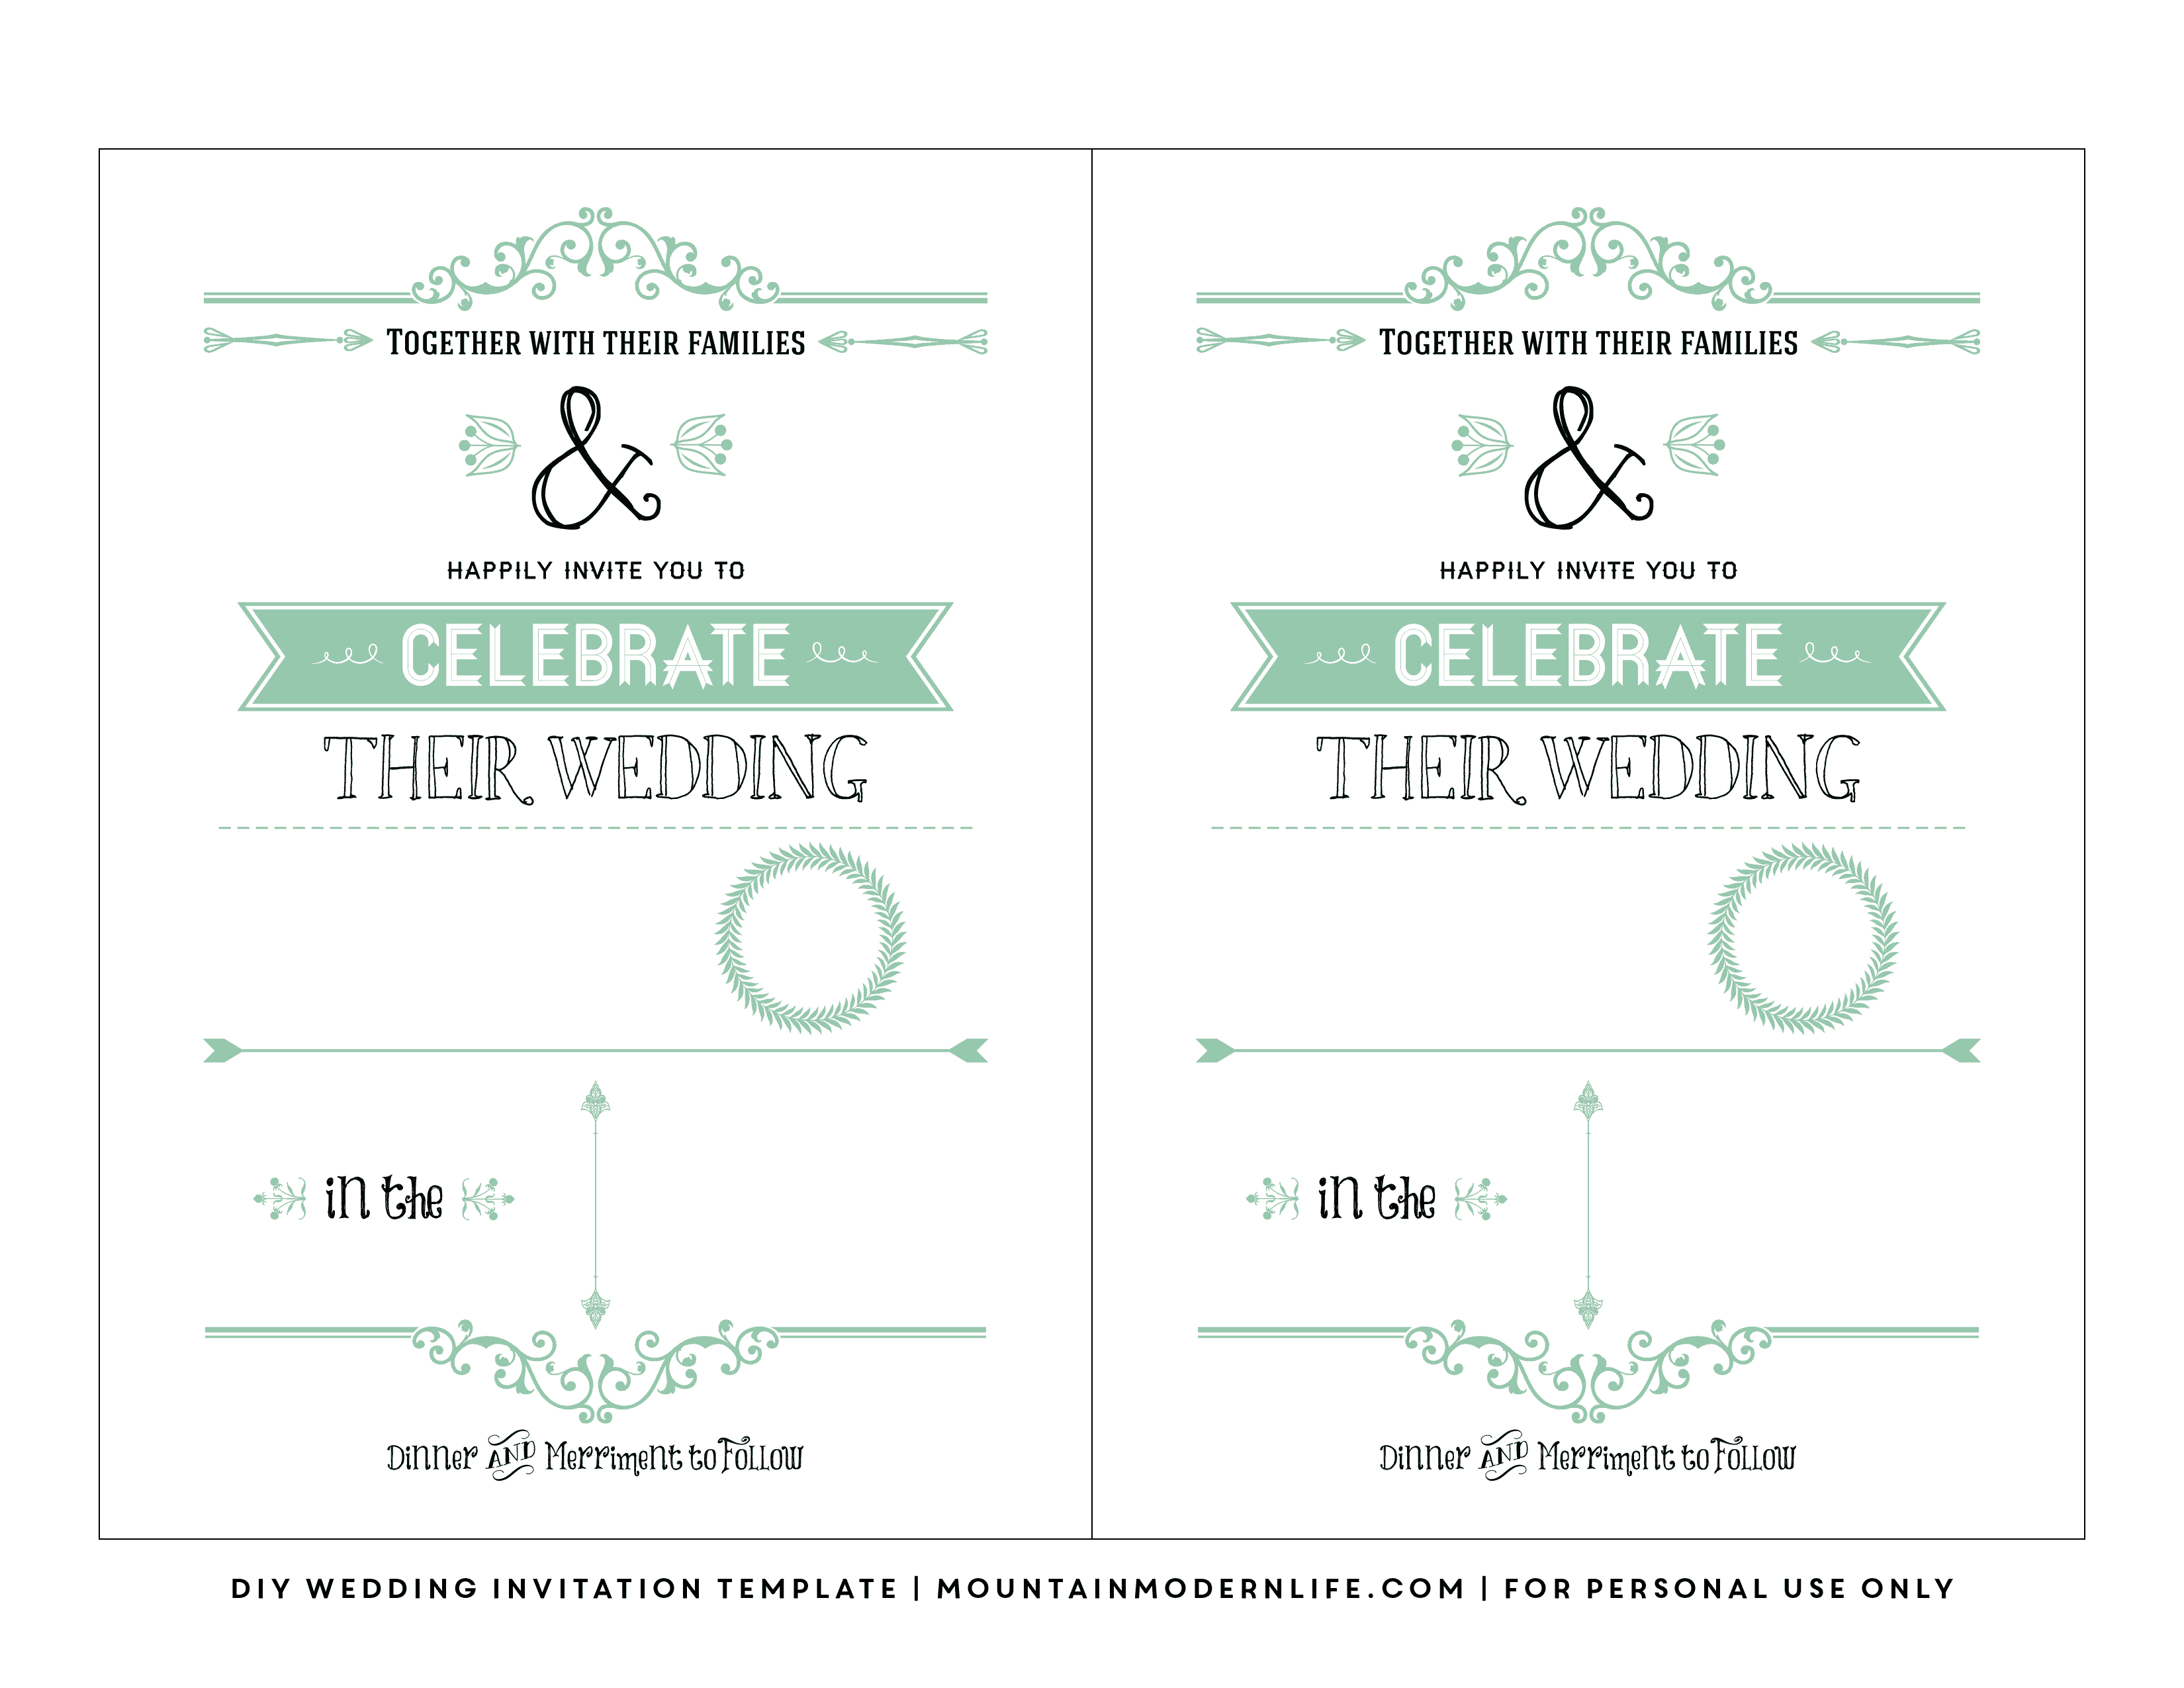 Free Wedding Invitation Template | Mountainmodernlife - Free Wedding Printables Templates